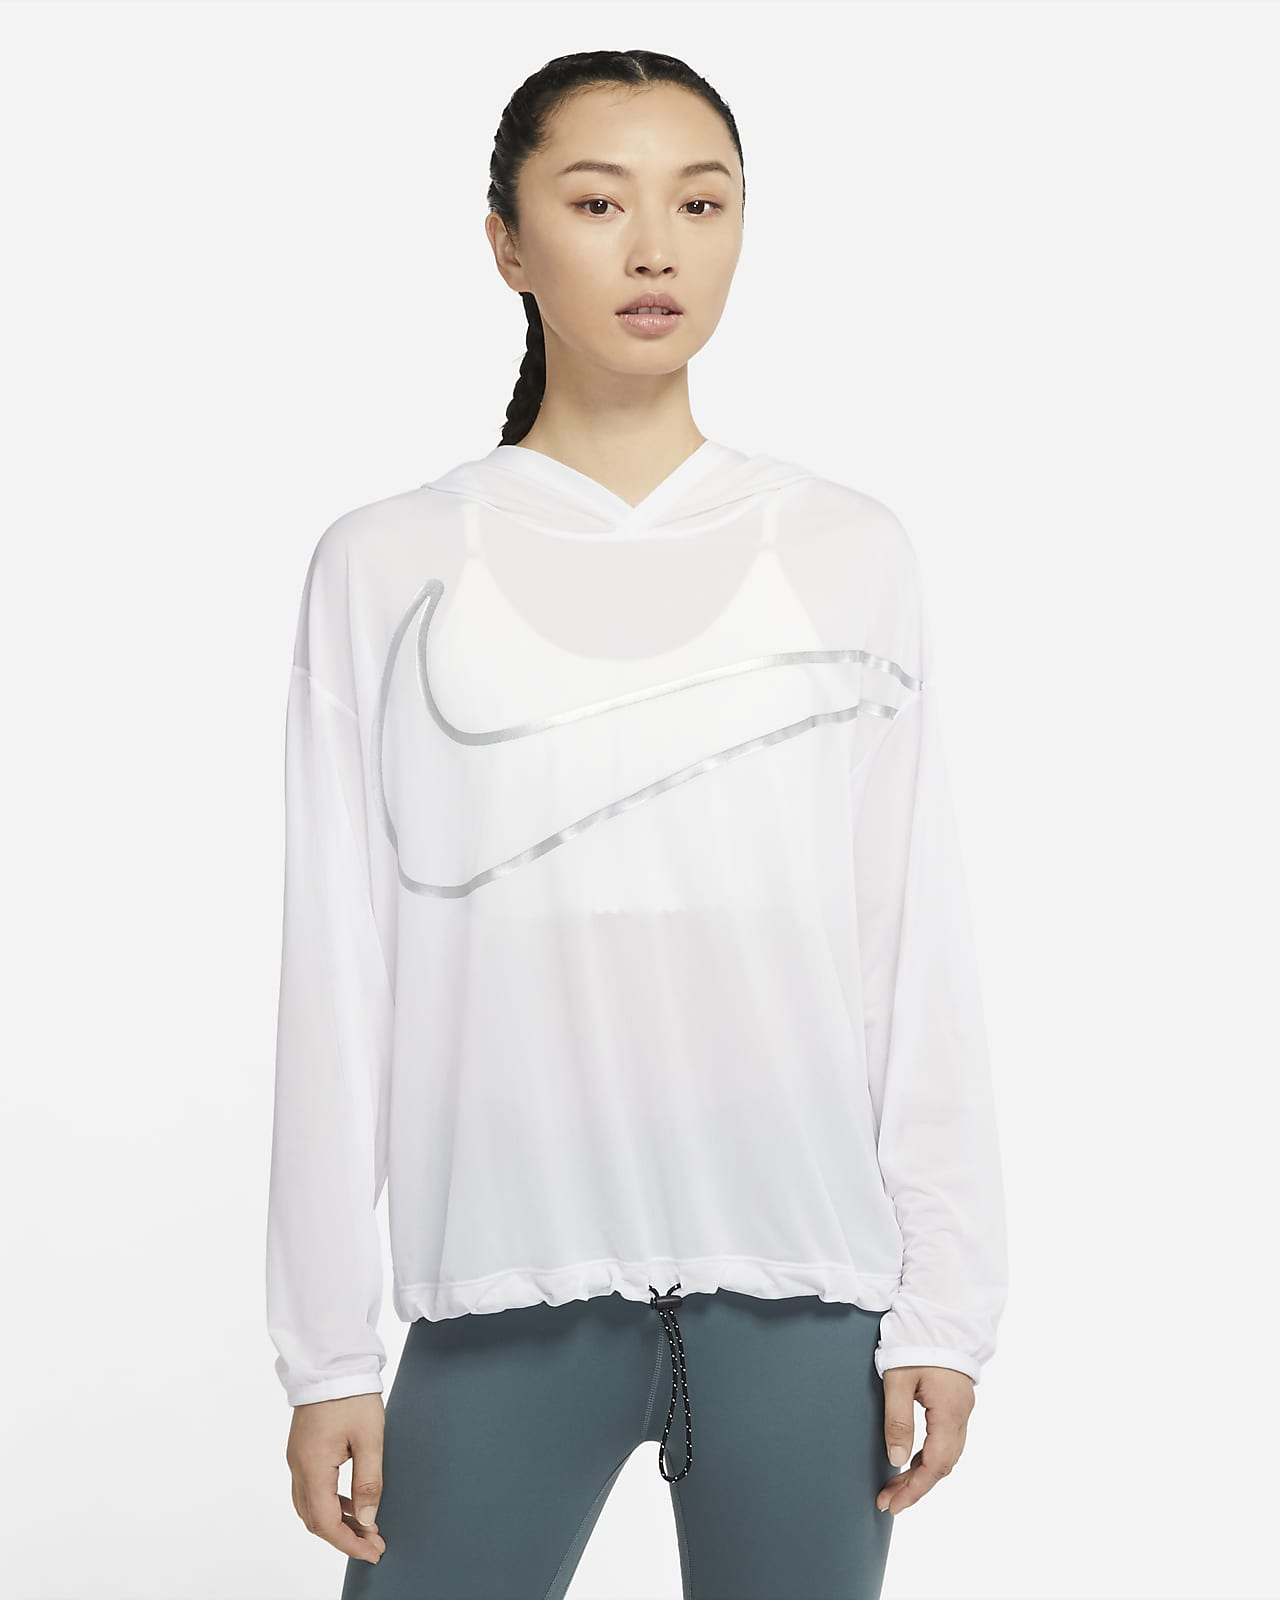 Nike Pro Collection 女子印花训练连帽衫